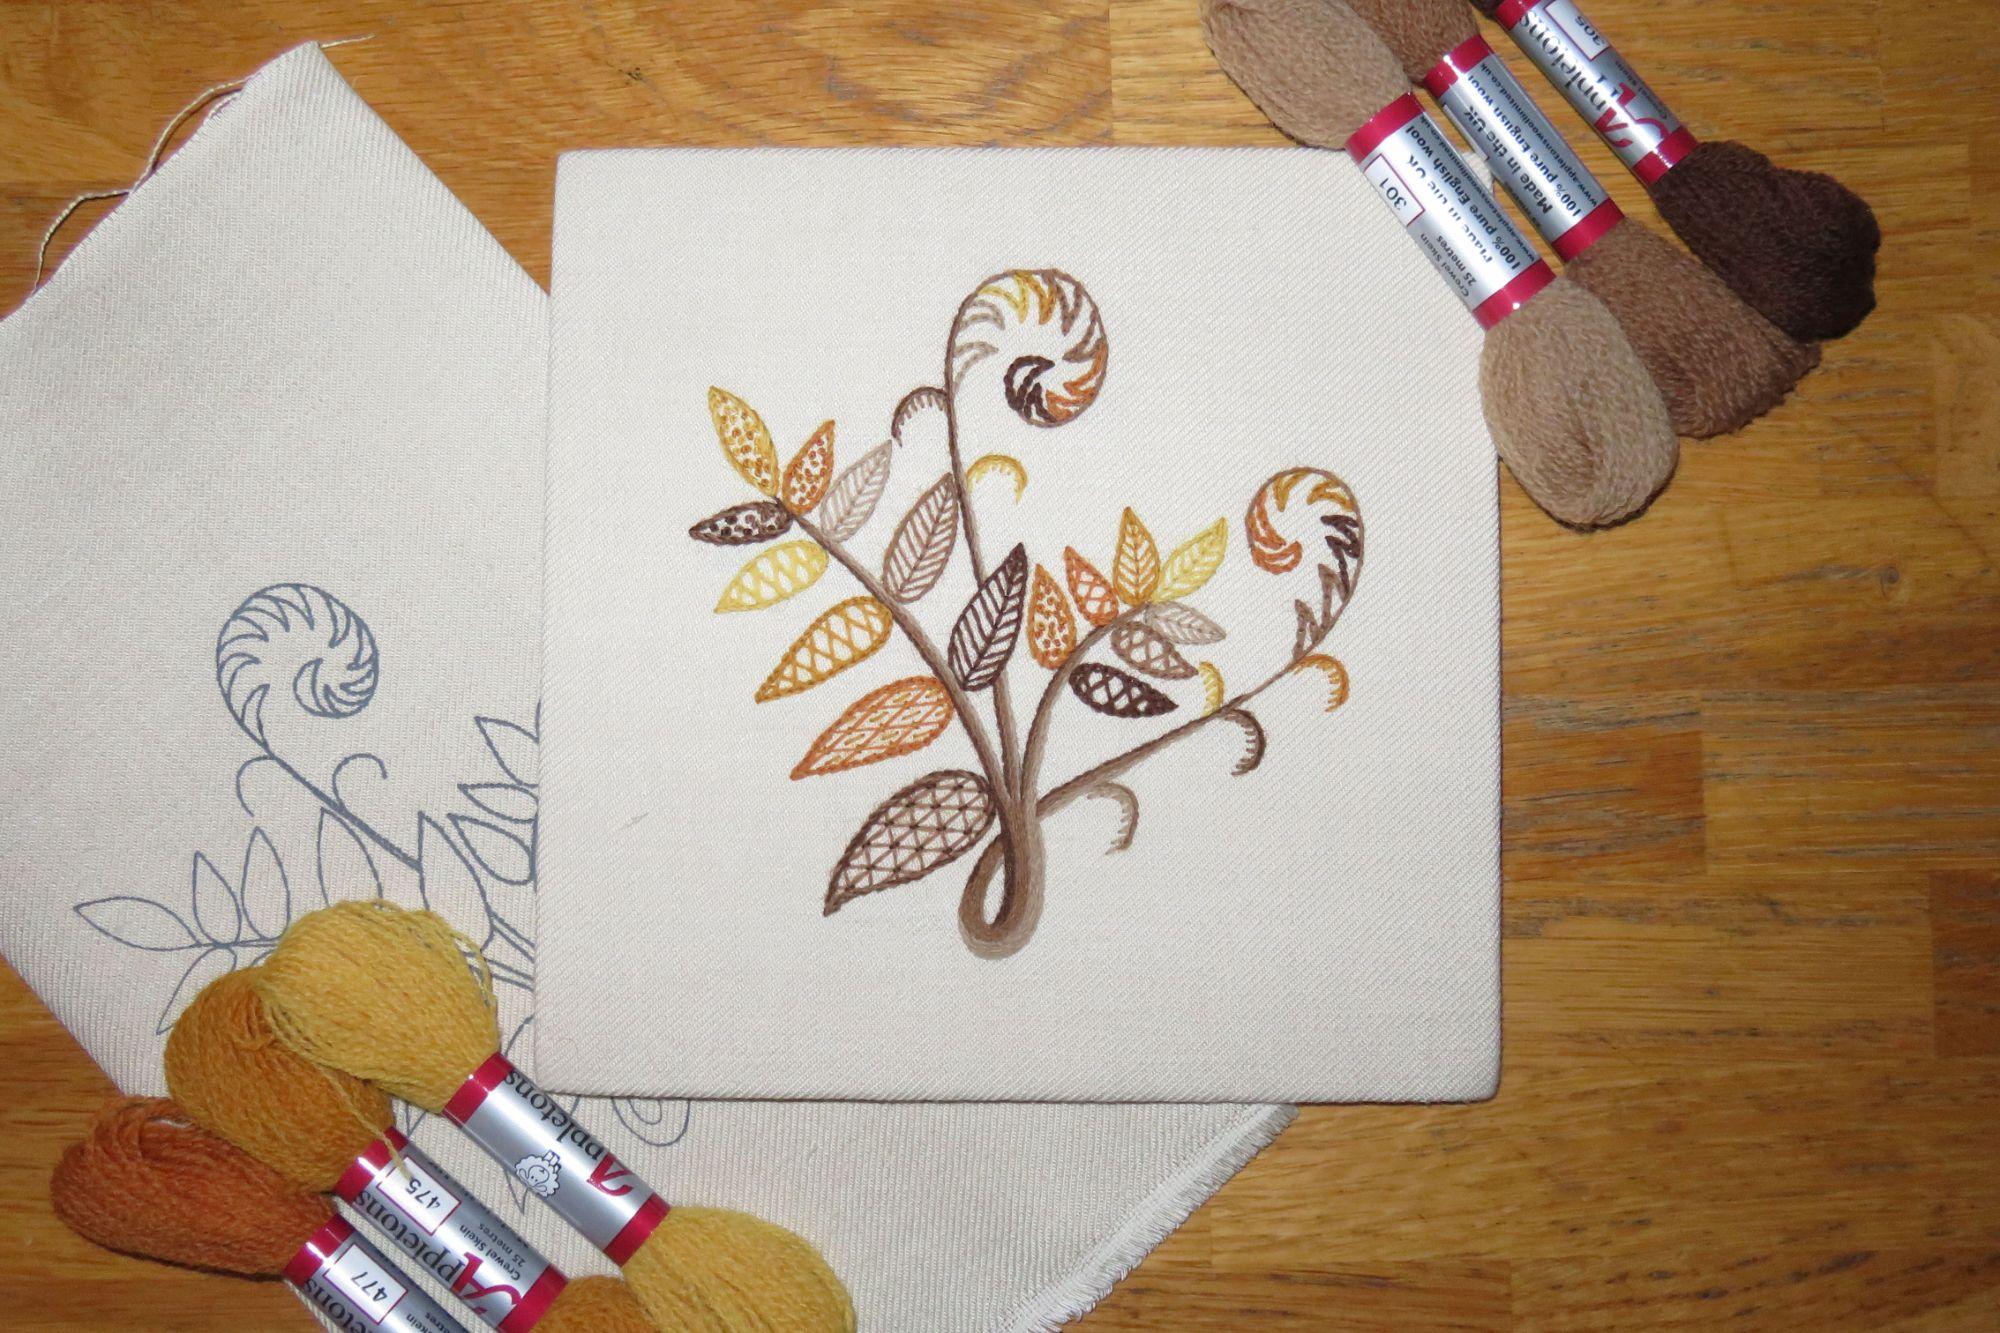 autumn-fern-embroidery-kit-quiltdragonkits.jpg